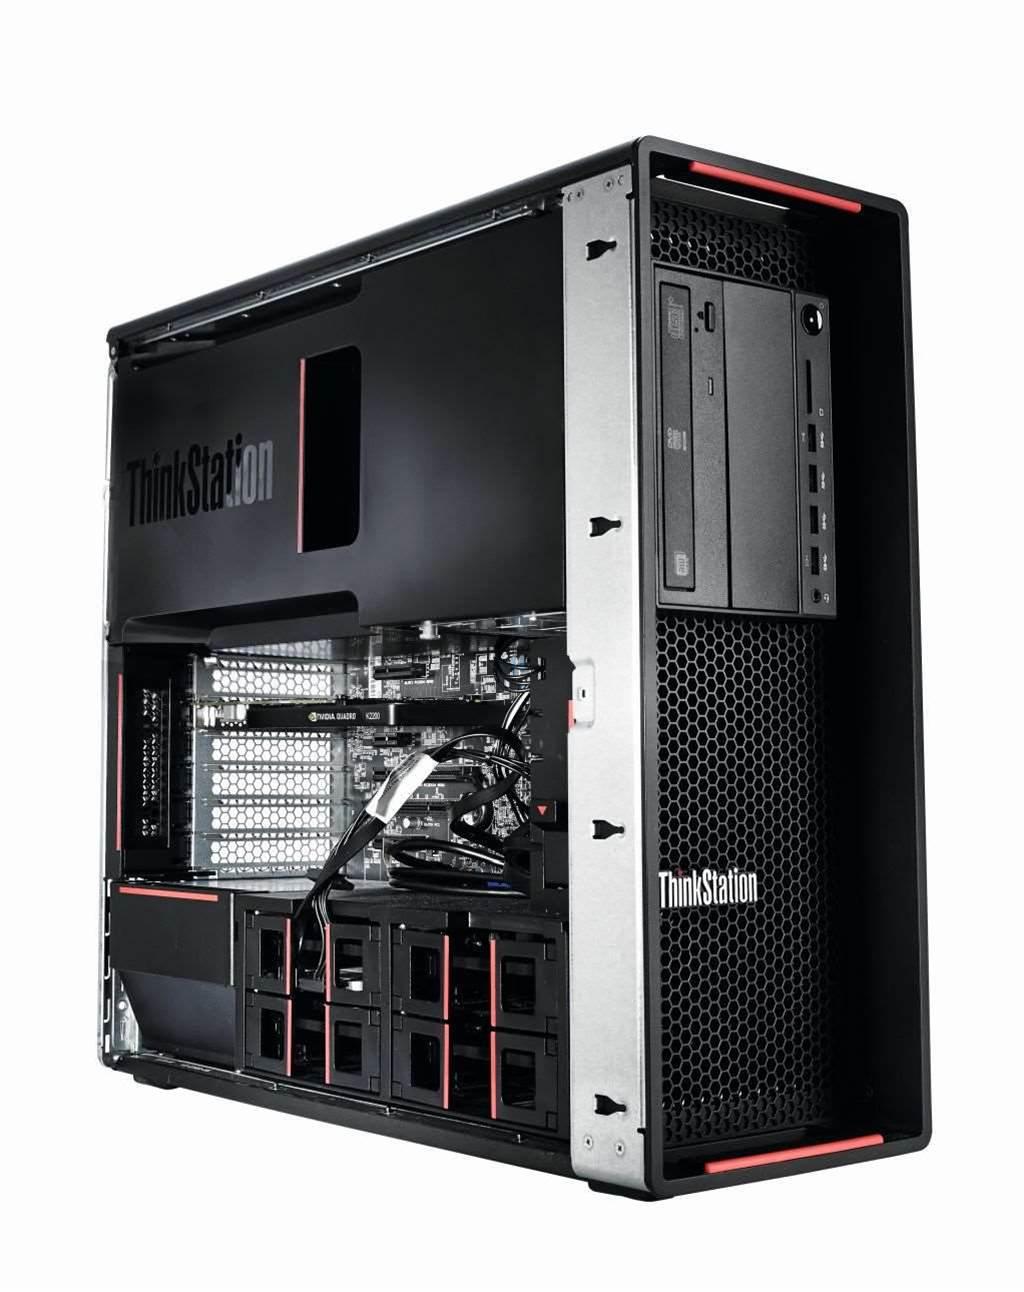 Lenovo Think Station P500